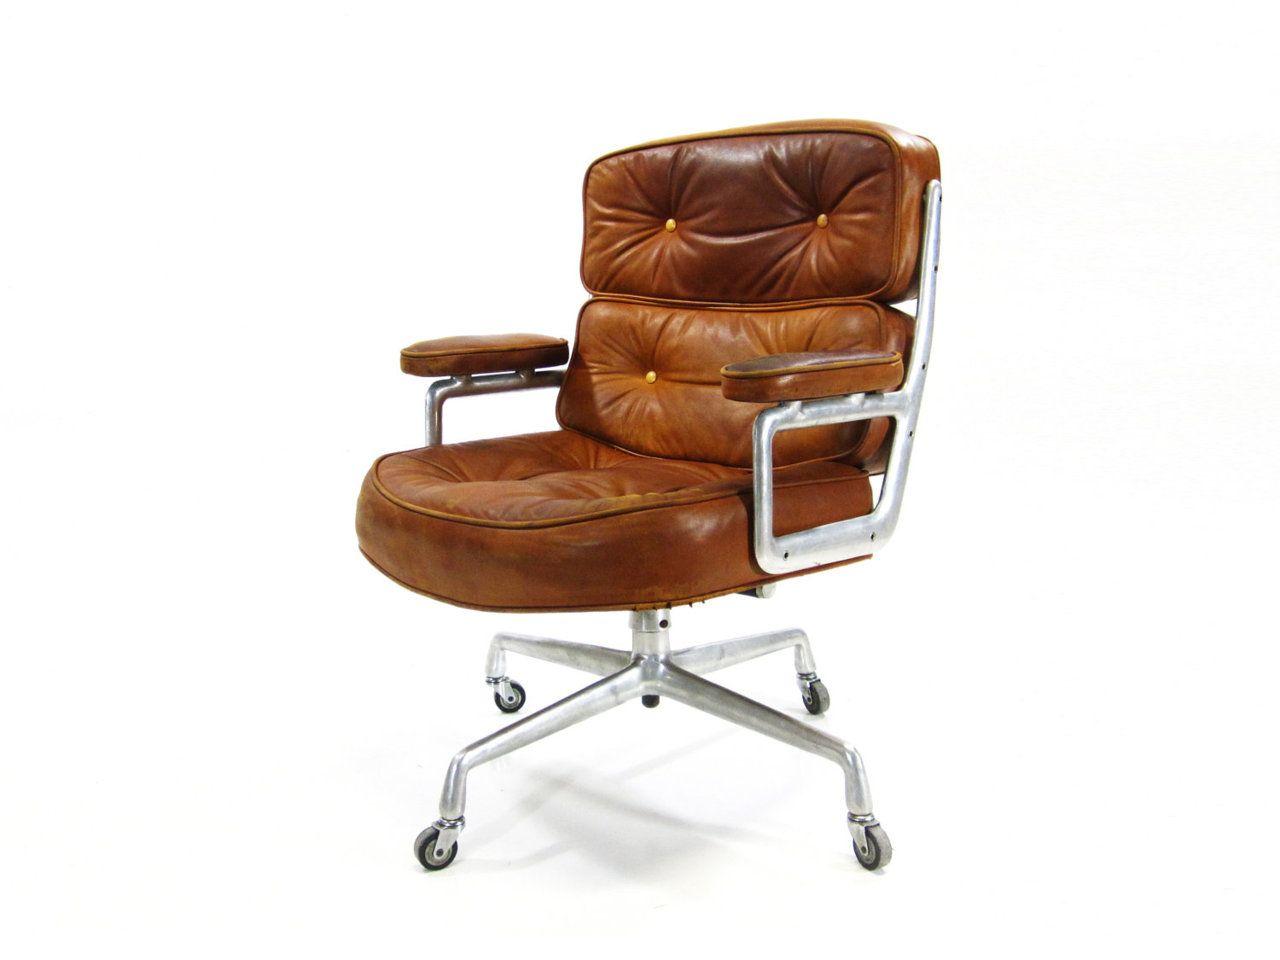 Vintage Herman Miller Time Life Chair Designed By Charles And Ray Eames Stuhl Design Retro Burostuhl Burostuhl